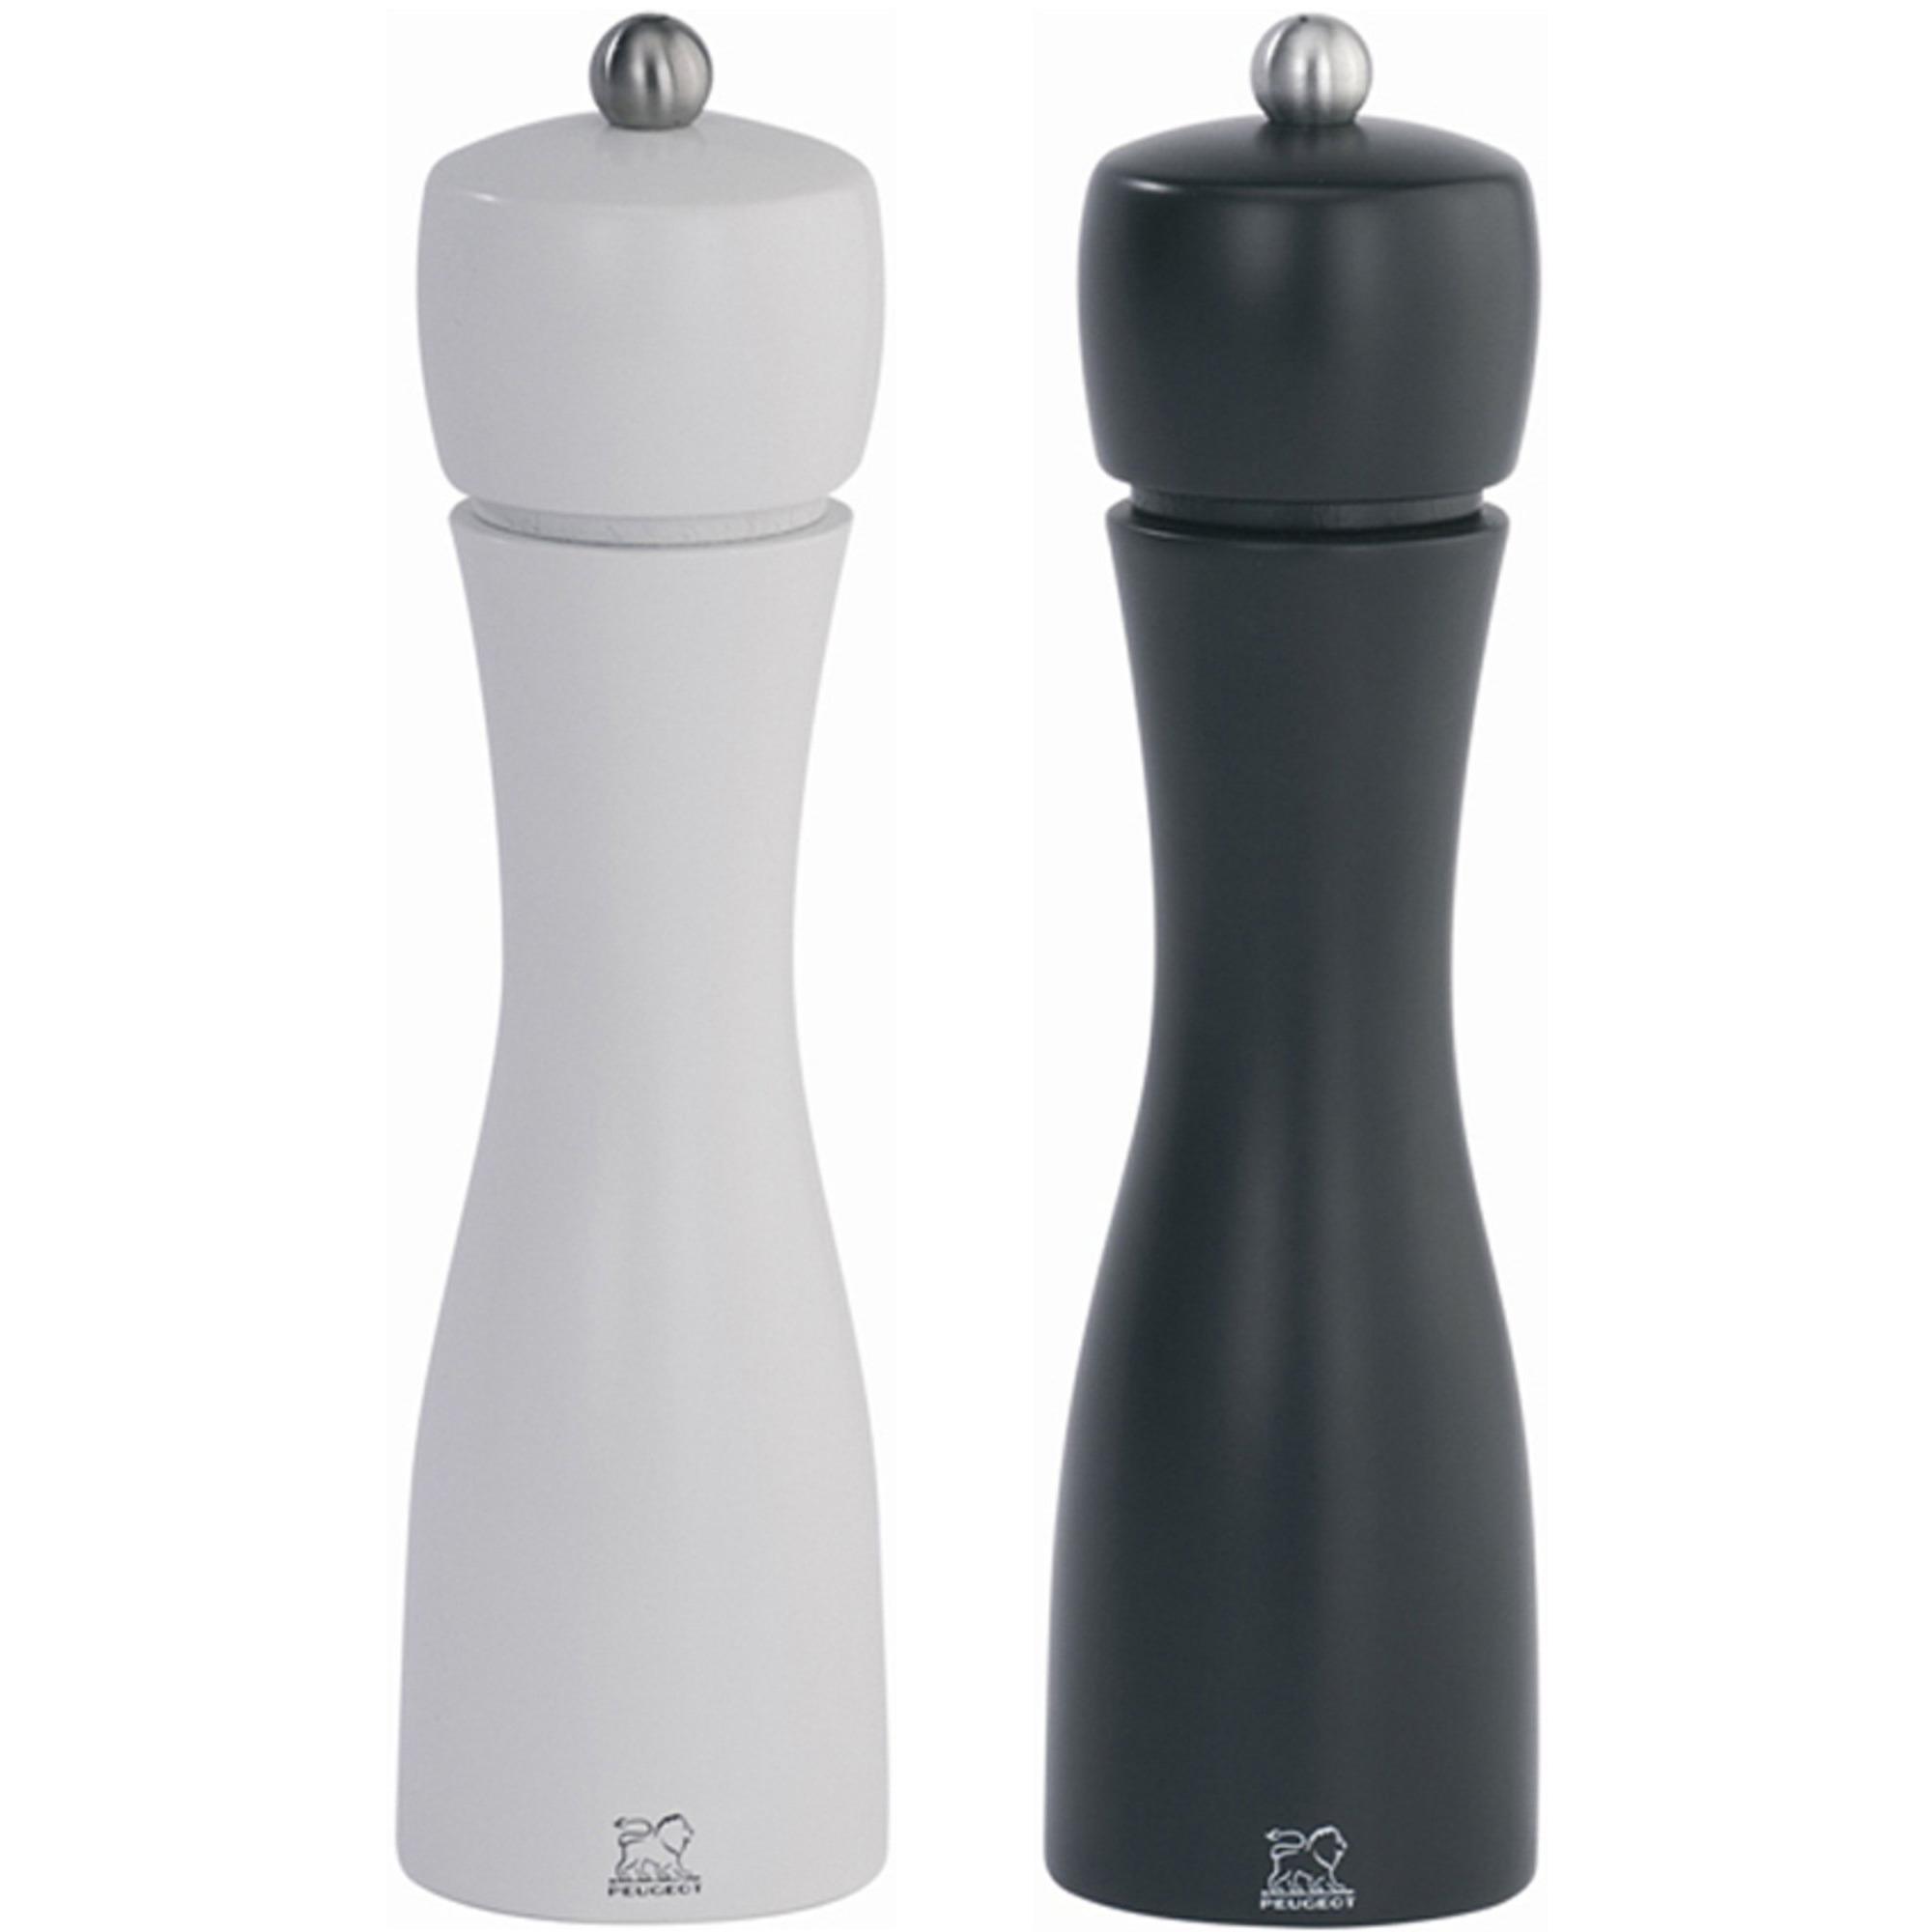 Peugeot Tahiti Duo Salt & Pepparkvarnar 20 cm Svart/Vit